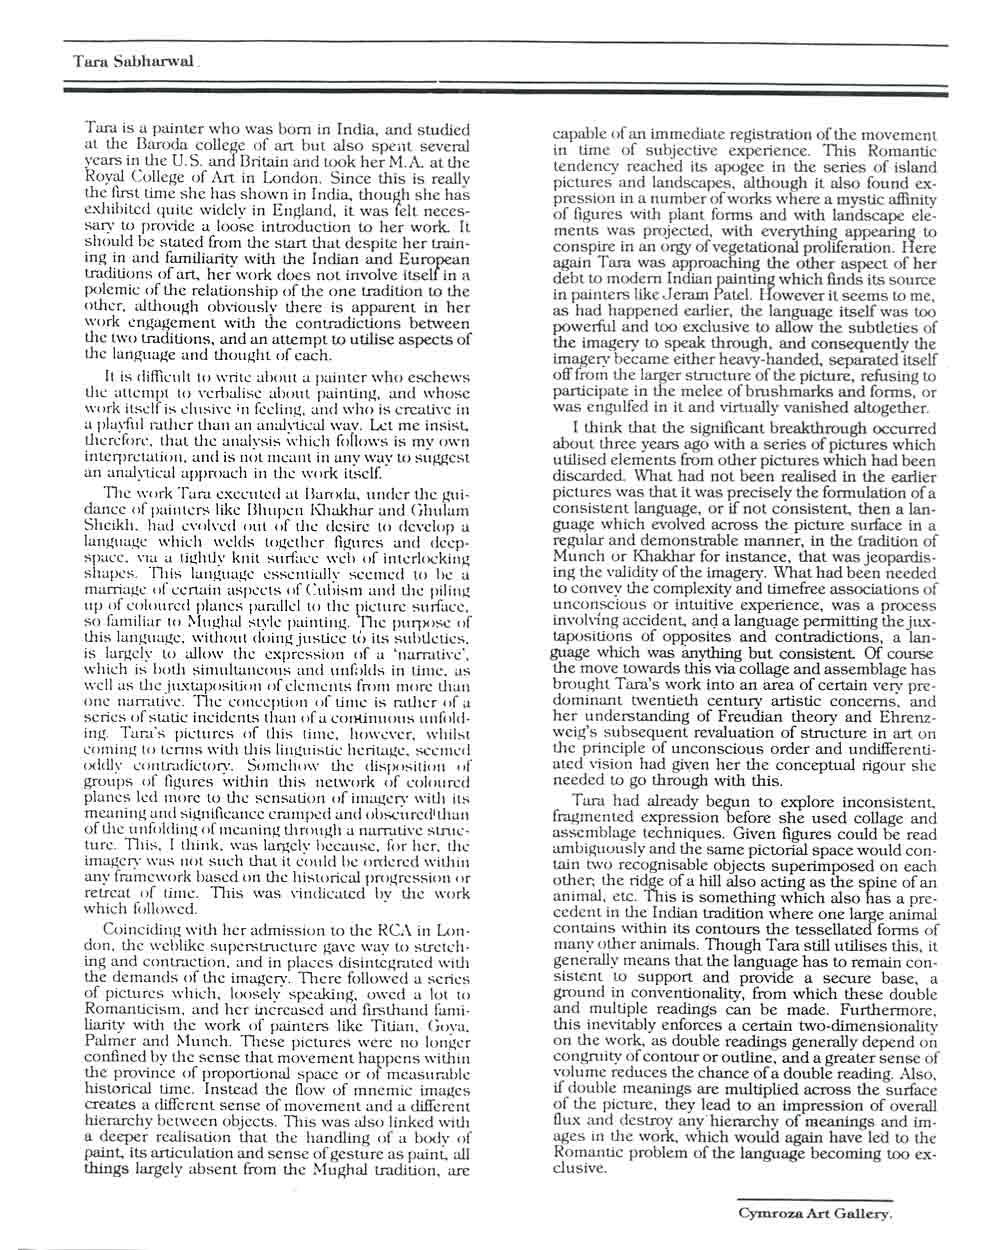 Essay by Ivan Prescott, pg 1